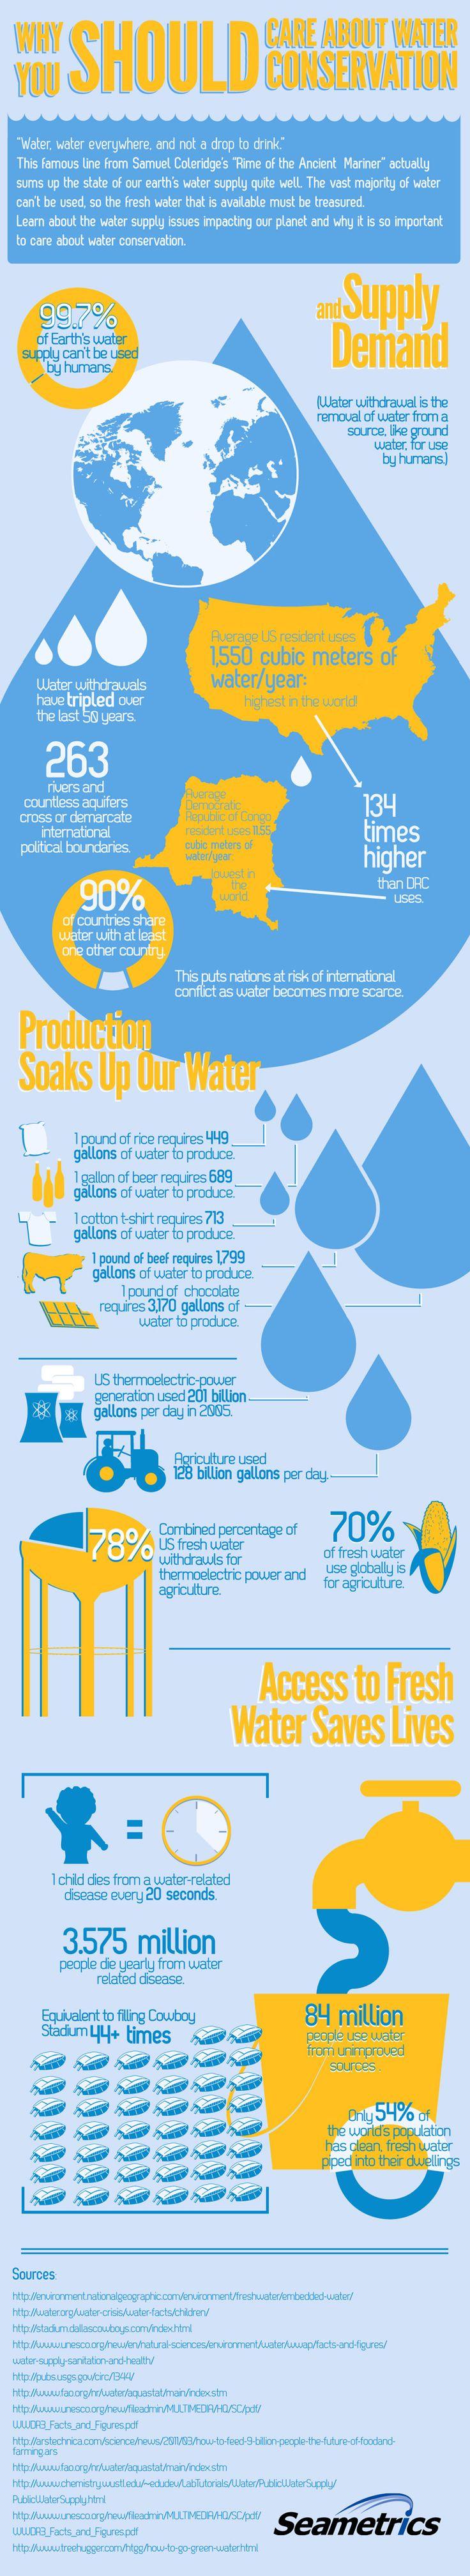 Sacramento County Water Agency